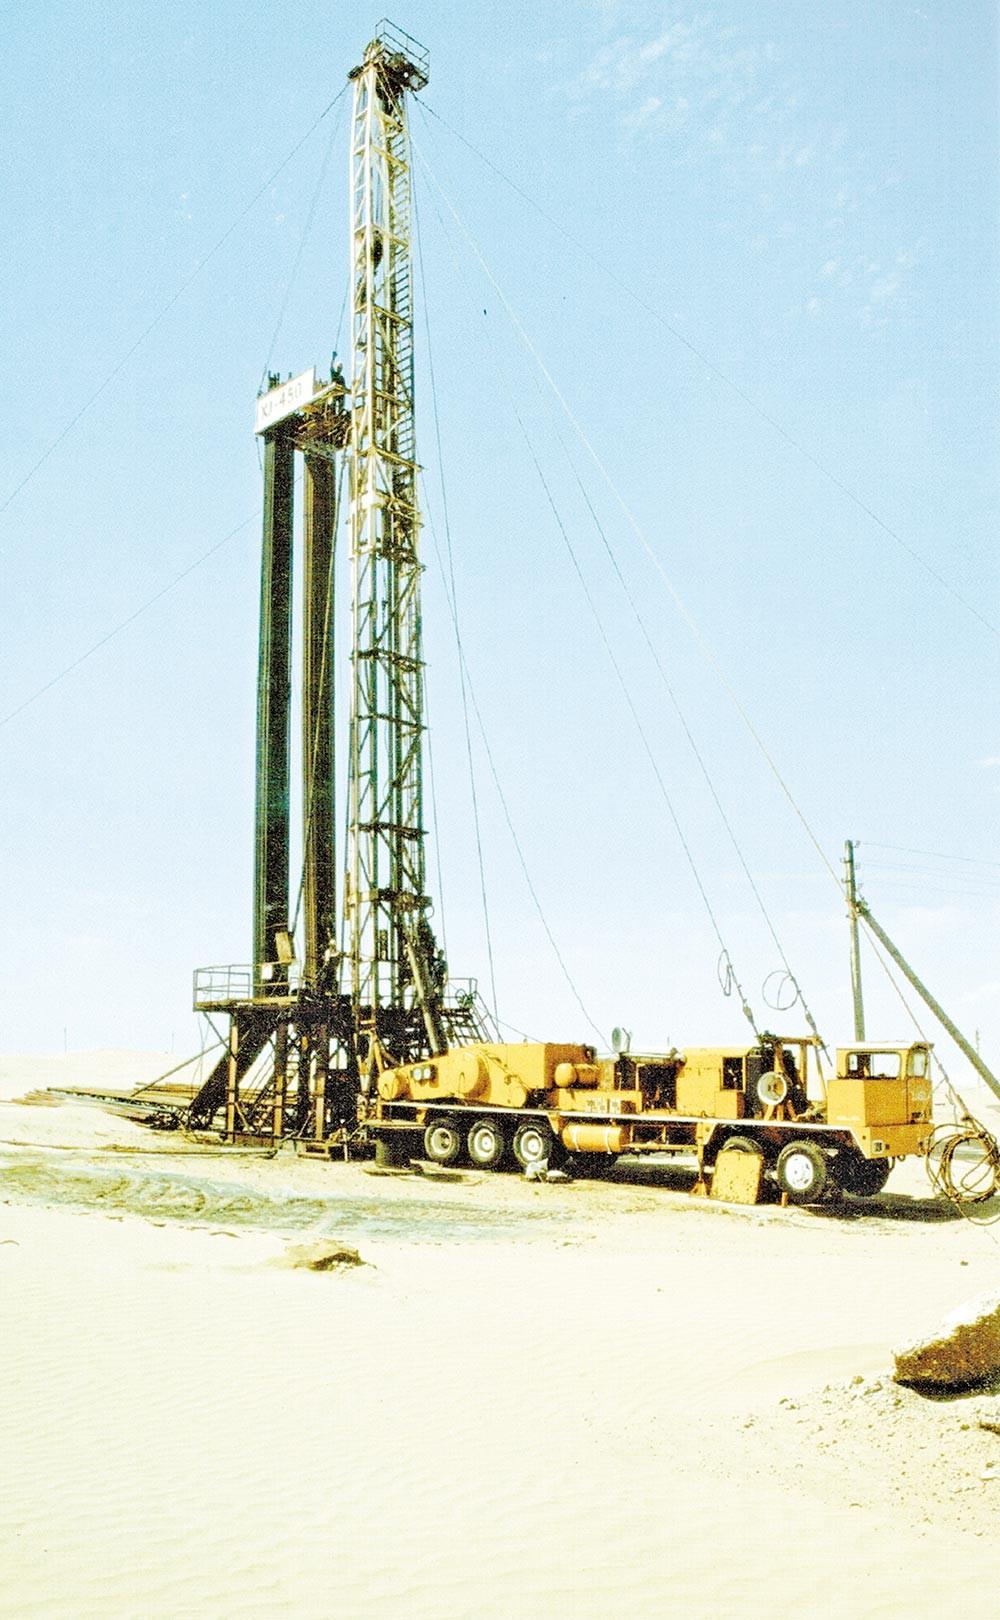 https://oilgas.gov.tm/storage/posts/2379/original-160c83f5b7fd8a.jpeg